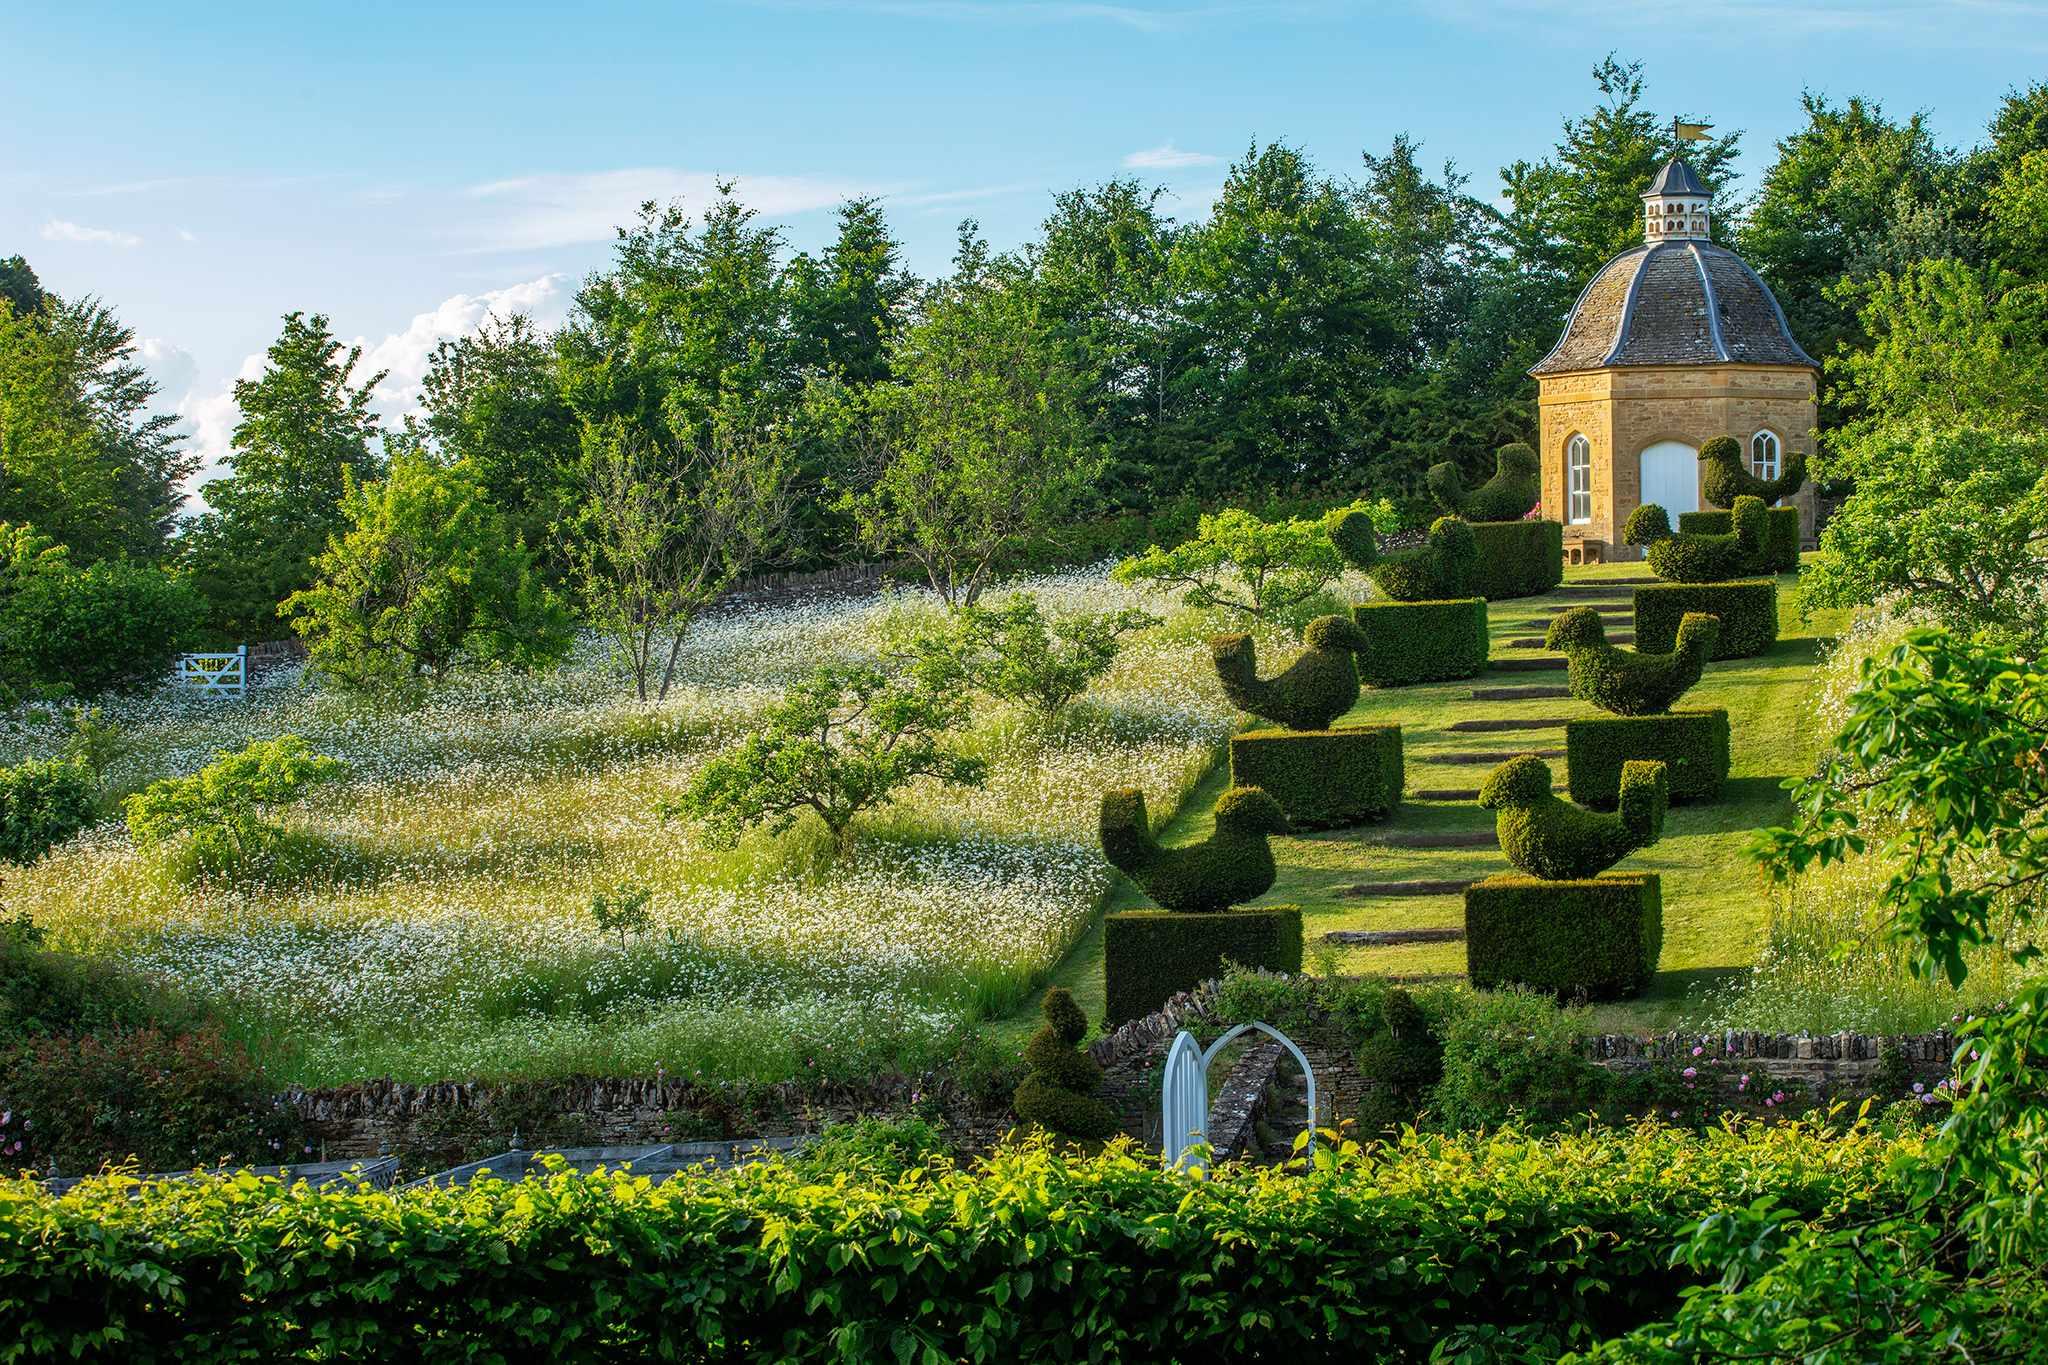 Rockcliffe Gardens